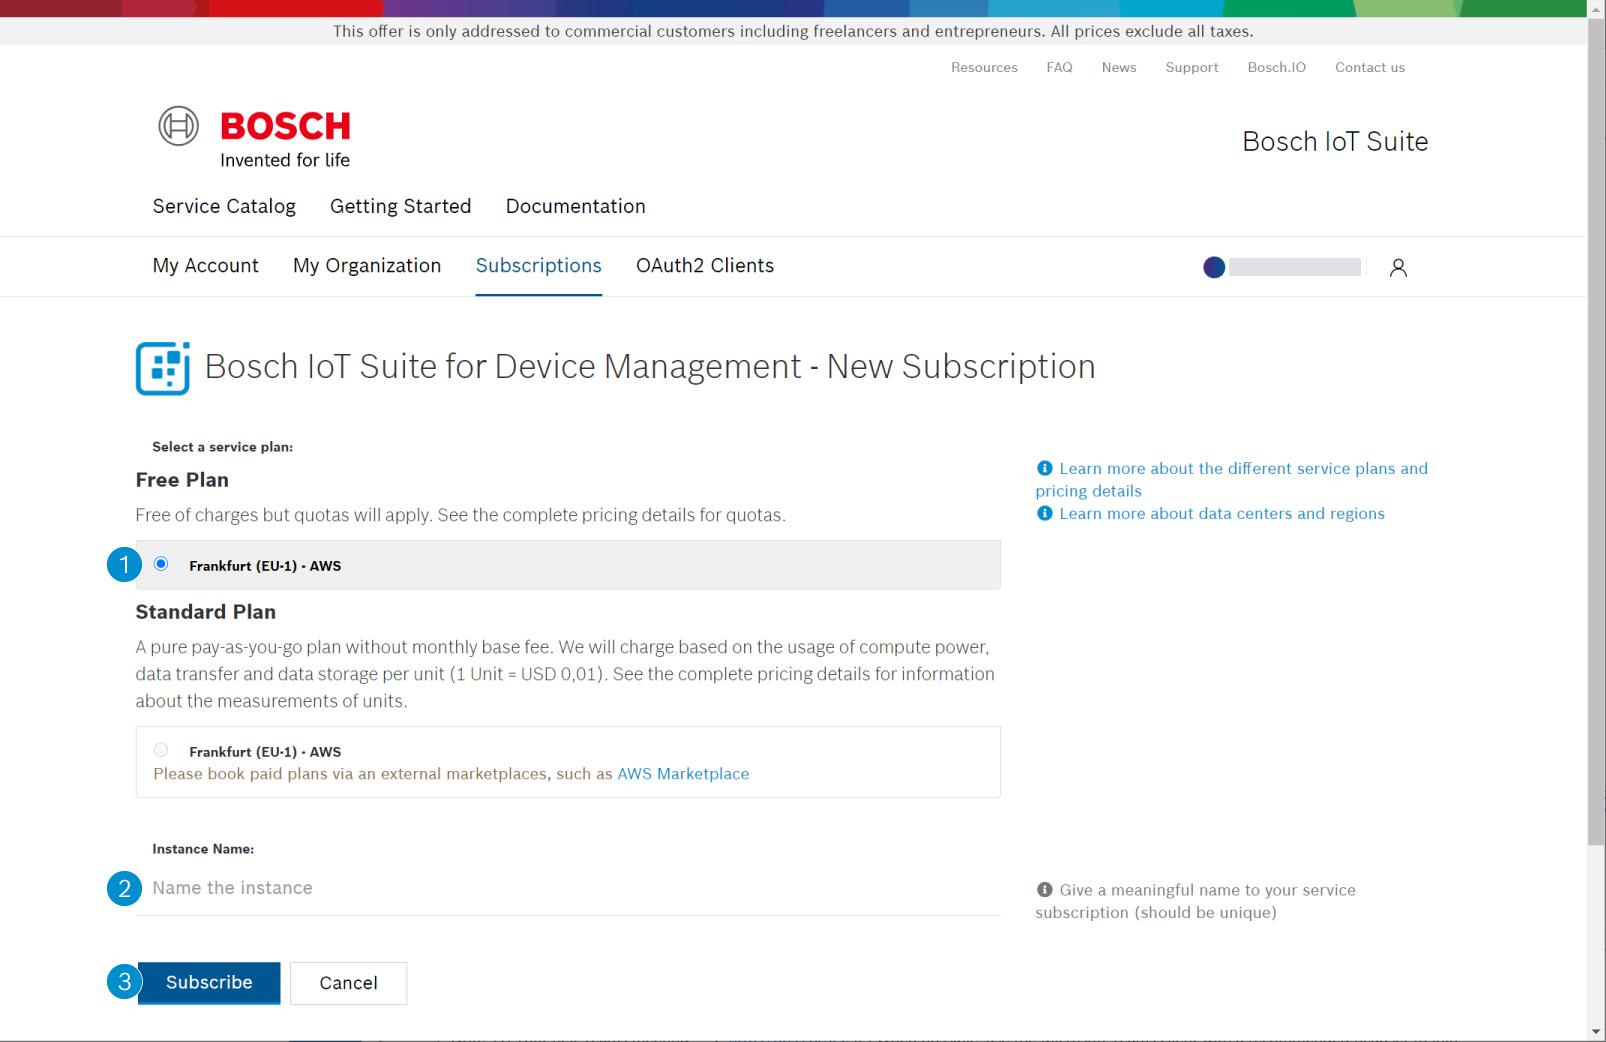 Configure your subscription